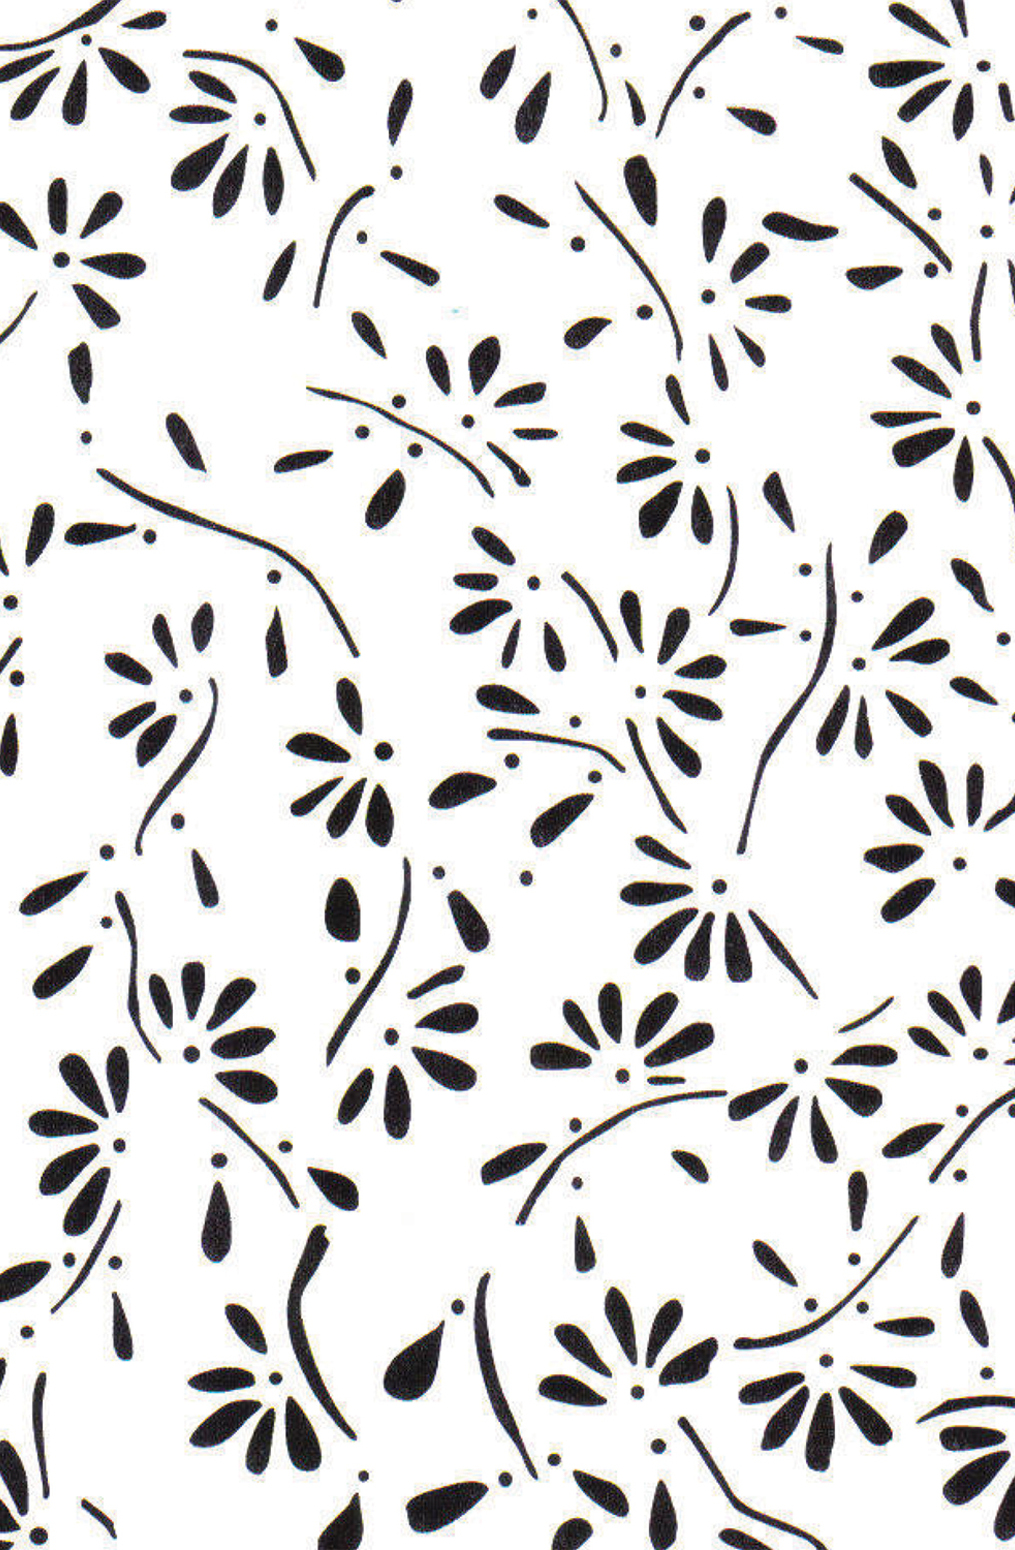 The school of making climbing daisy stencil 1